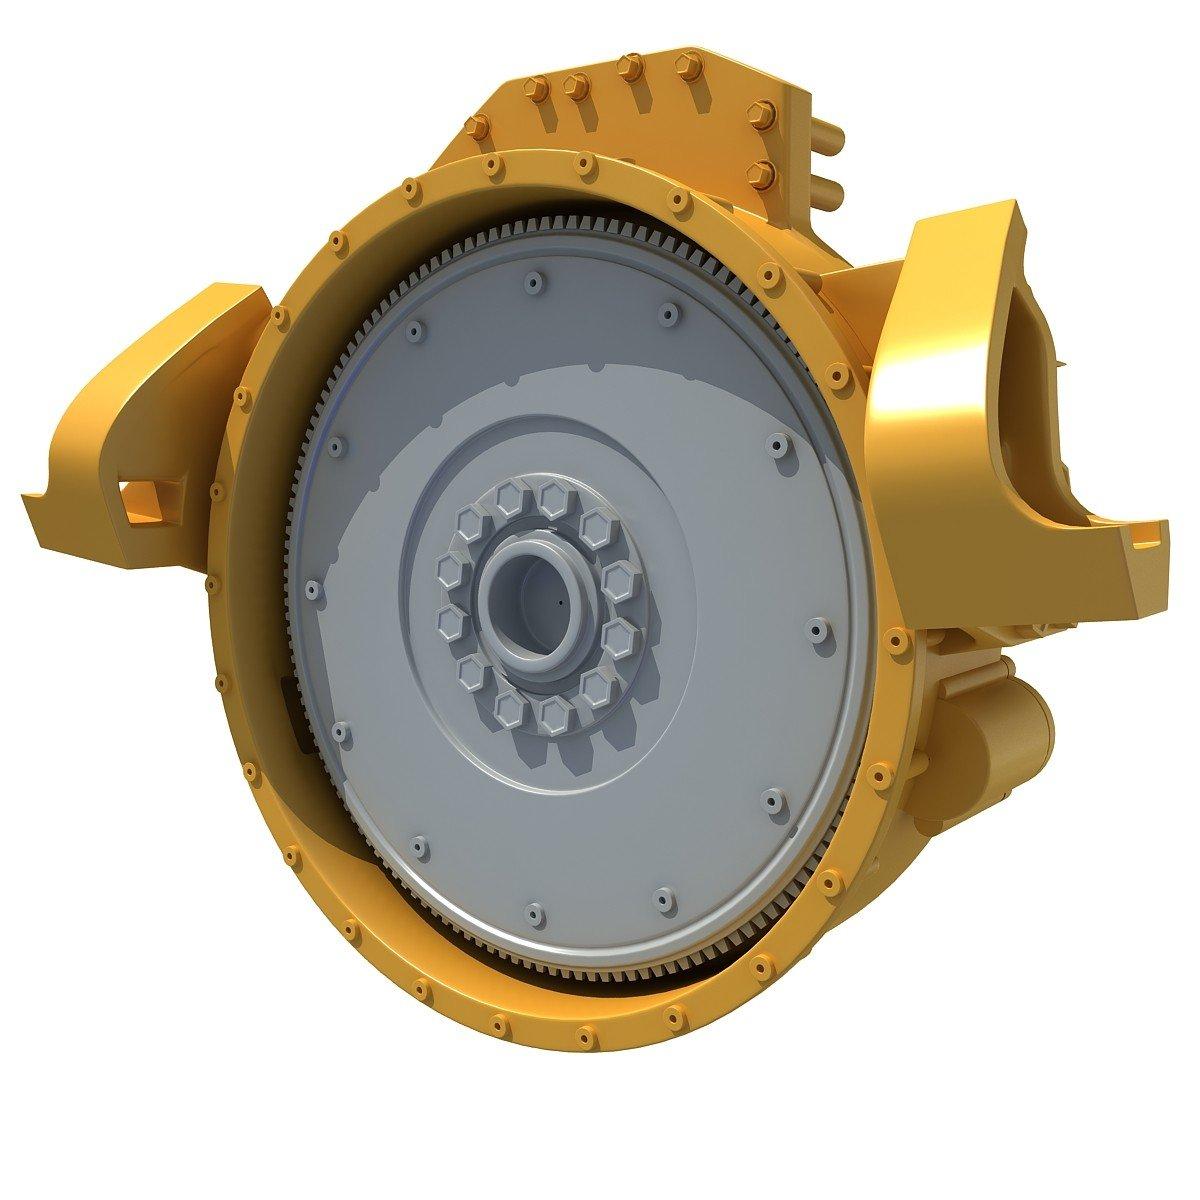 3D Engine Parts  #3D #3dEngine #3dParts https://www.3dhorse.com/collections/3d-engines/products/3d-engine-parts-models-1…pic.twitter.com/czl2a9fmWX